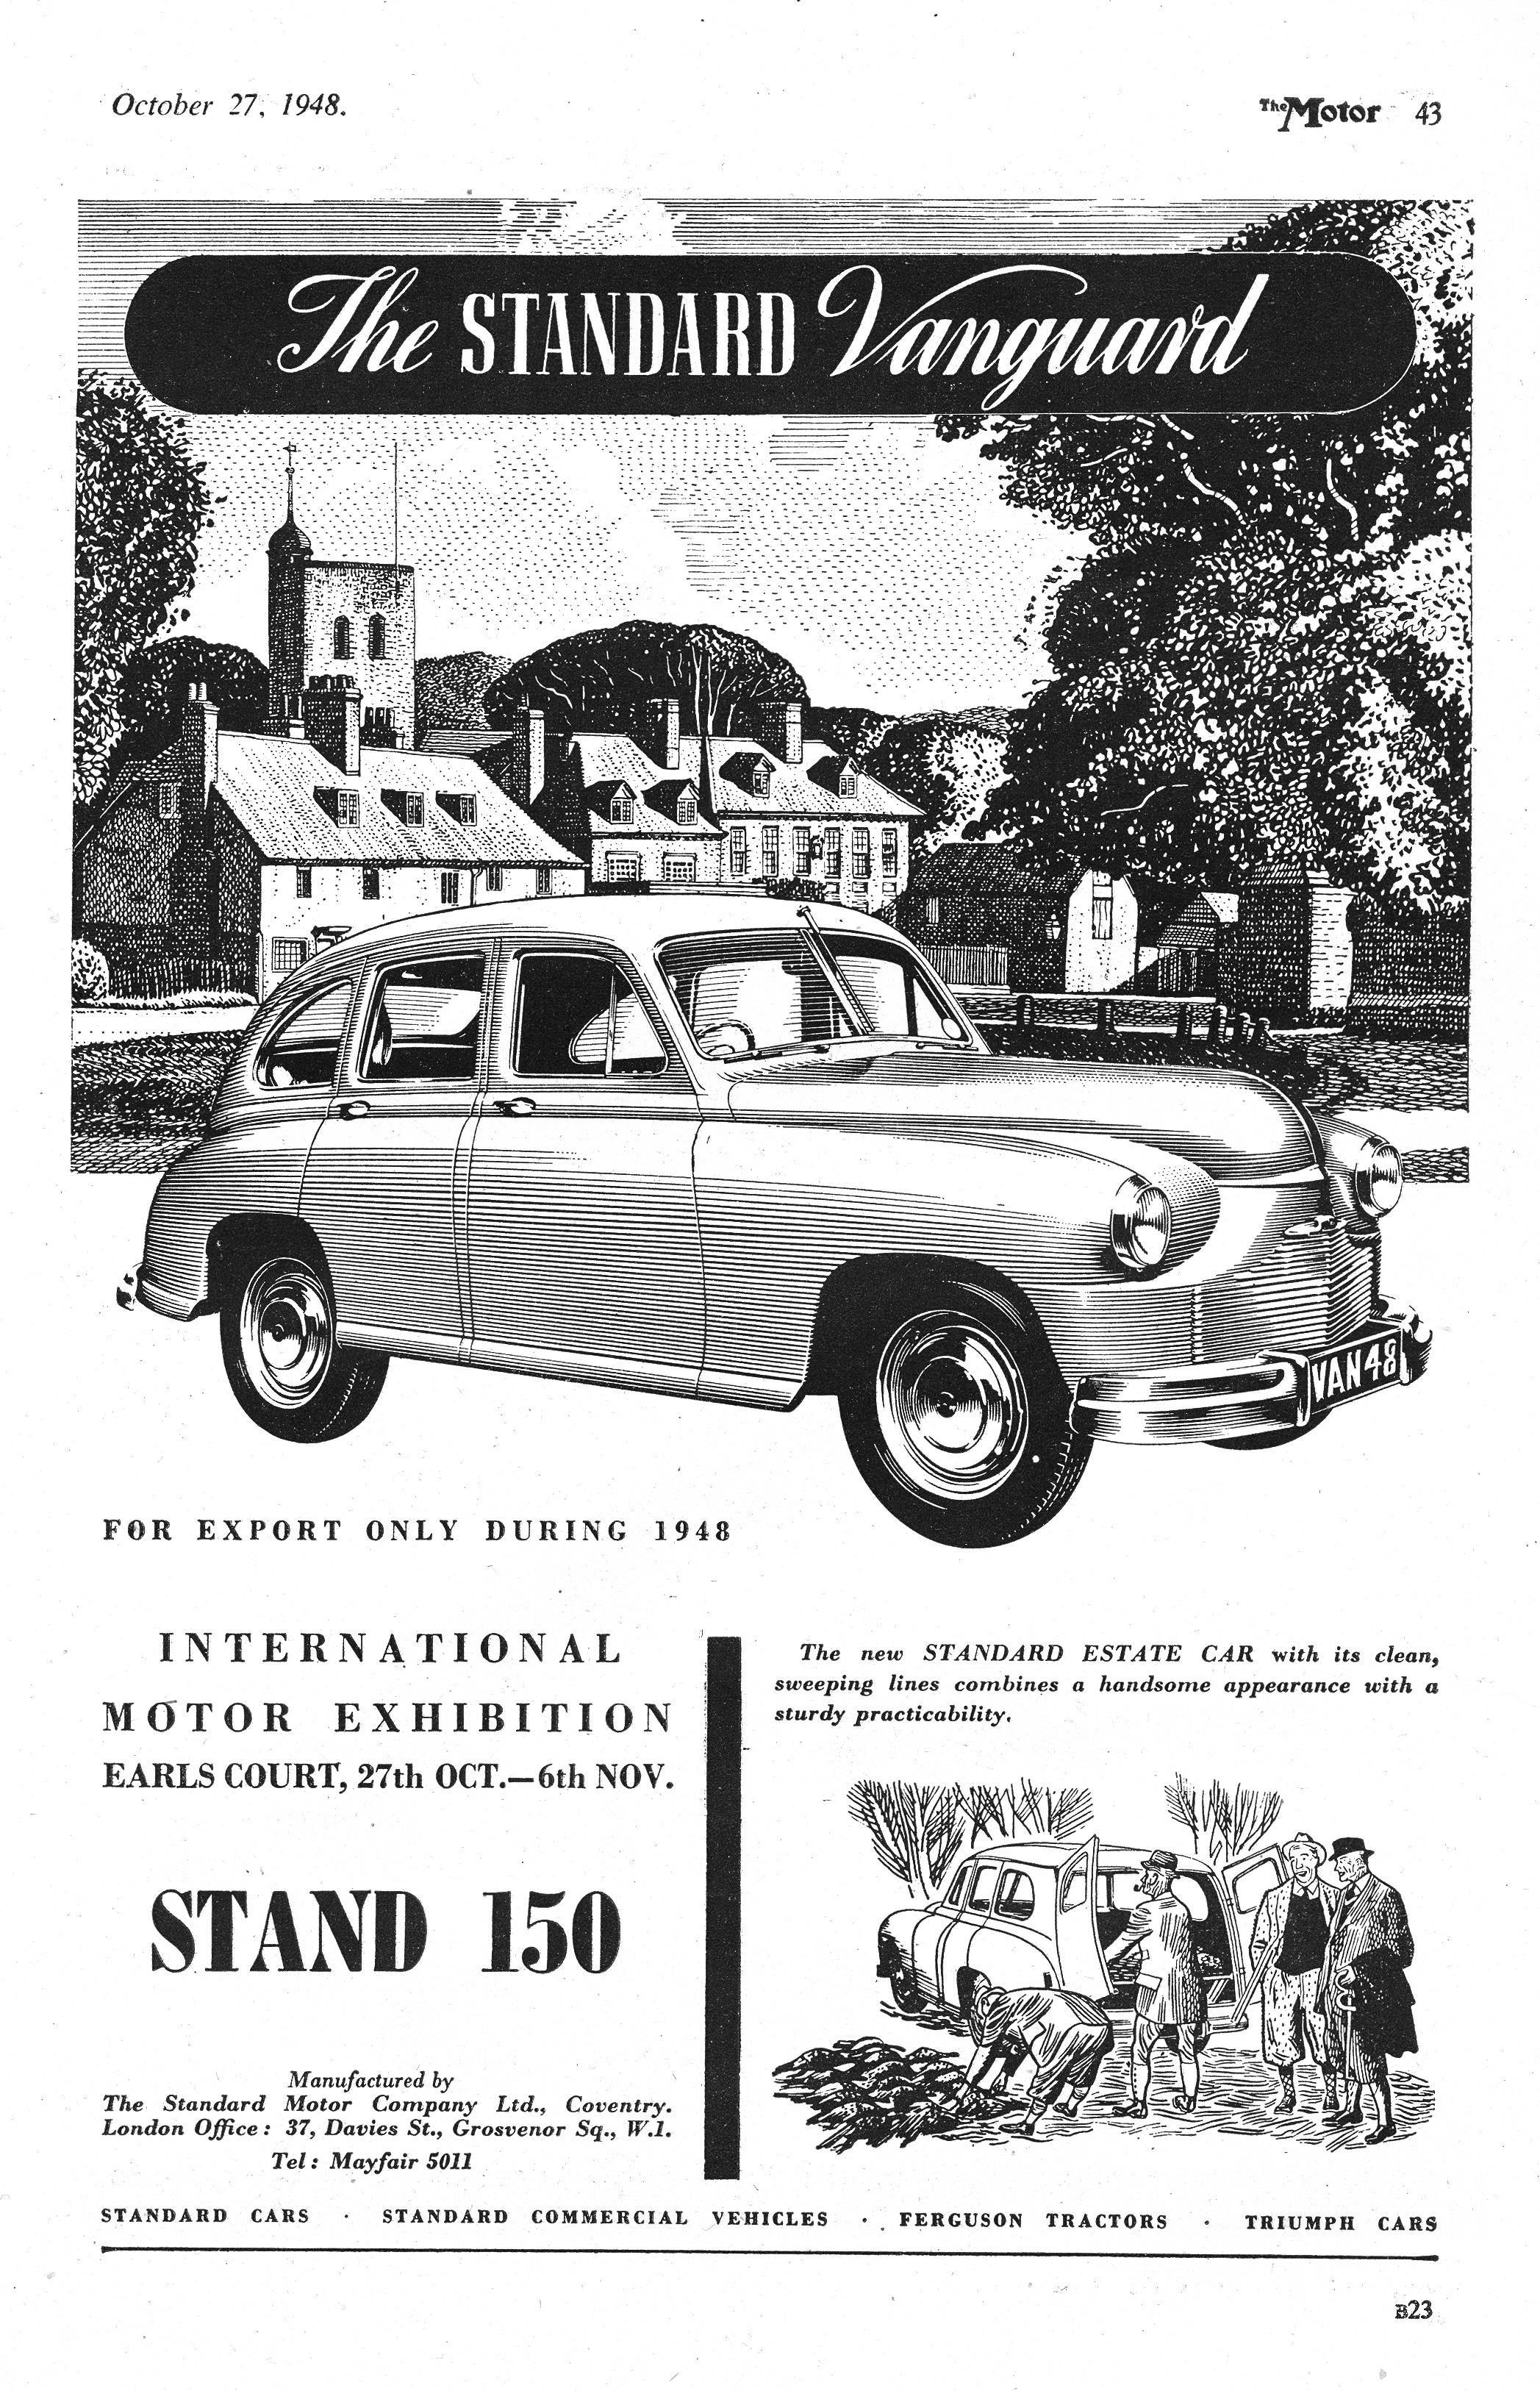 Standard Vanguard Motor Car Autocar Advert 1948. My 1956 TR2 used ...